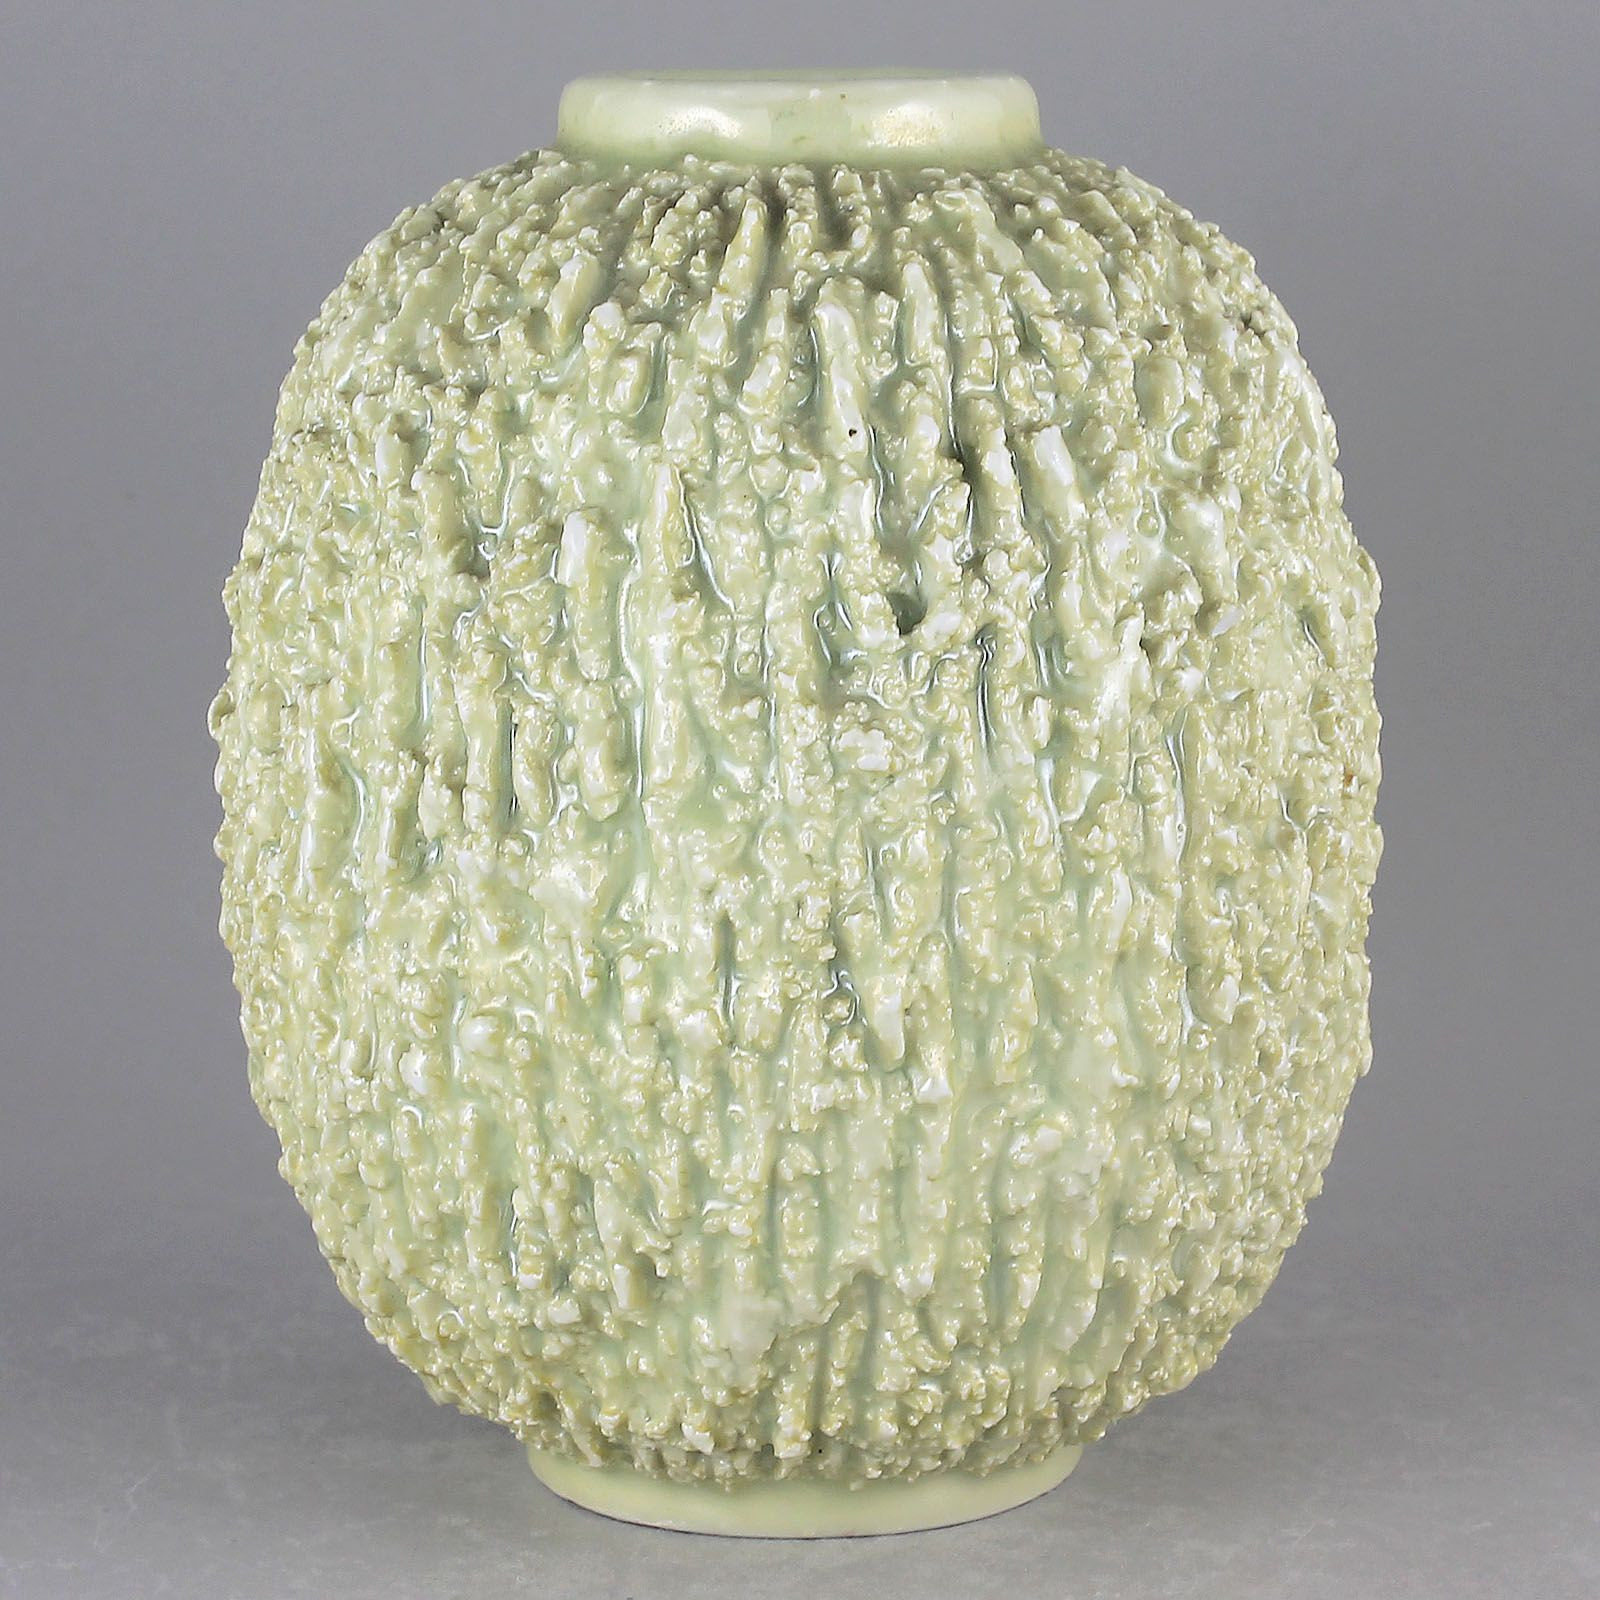 Modern White Ceramic Vase Of Gunnar Nylund 1936 Hypnotic Hedgehog Vase In White Medium Pertaining to Gunnar Nylund 1936 Hypnotic Hedgehog Vase In White Medium